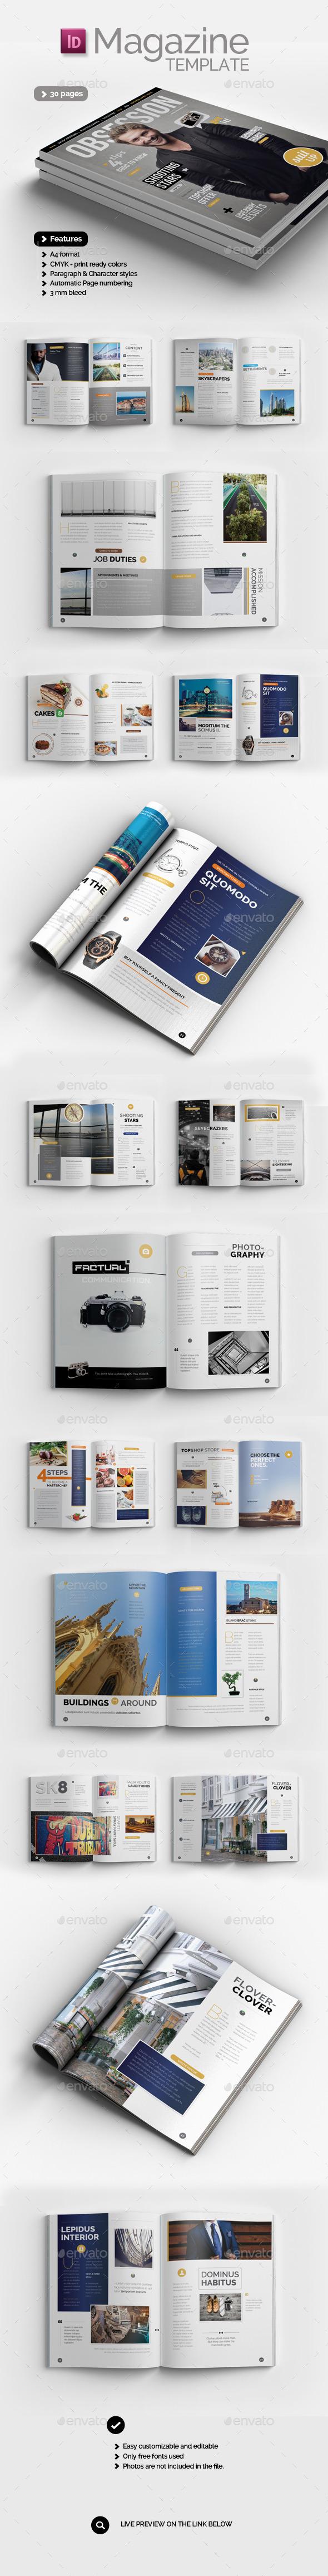 Obsession Magazine Template - Magazines Print Templates